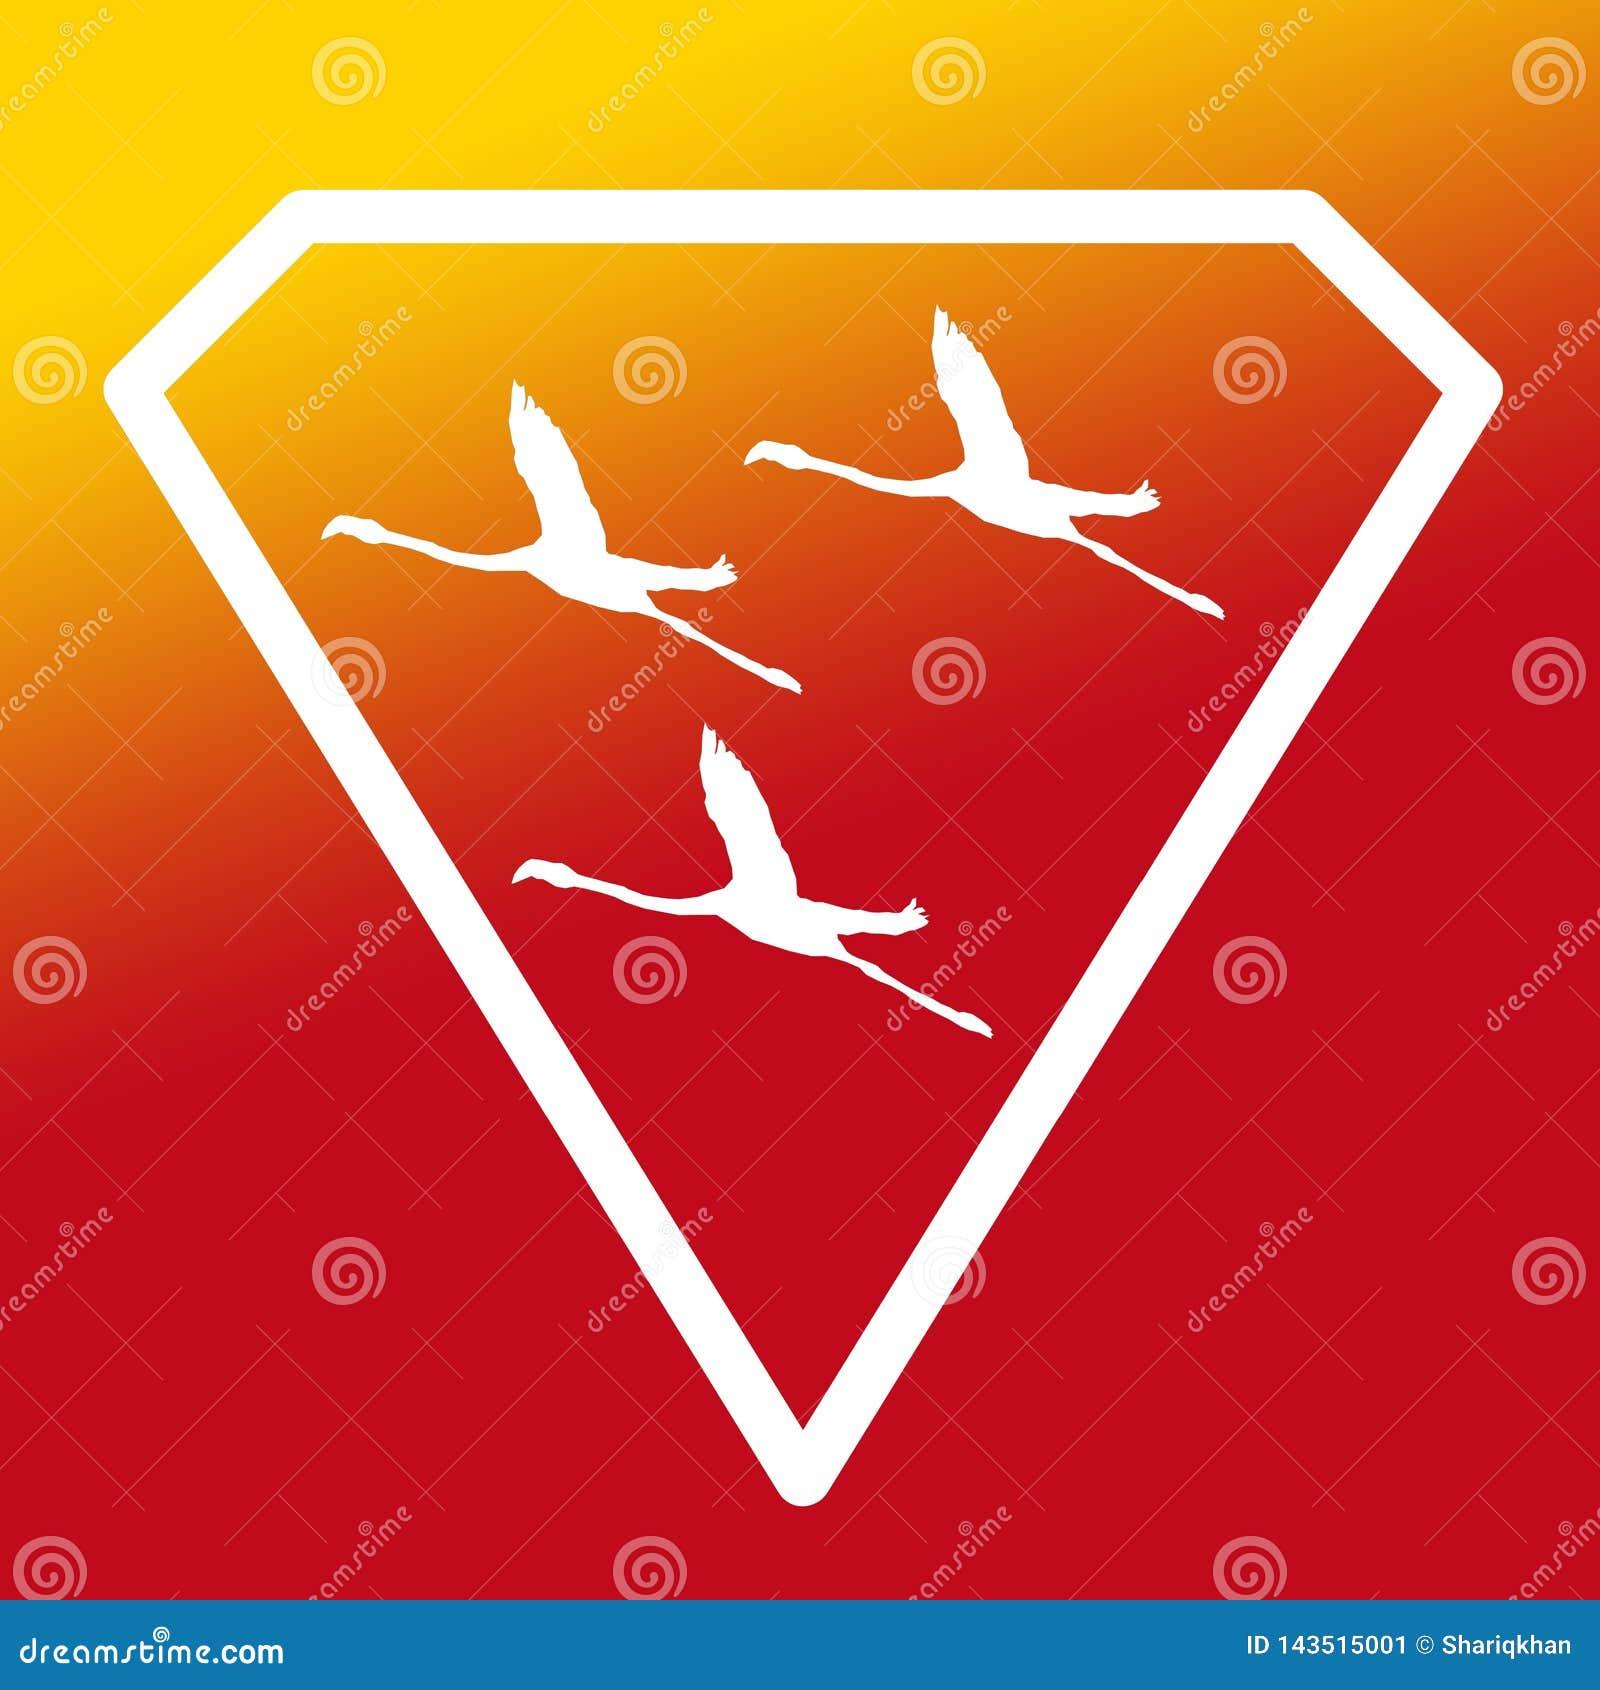 Pájaros de Logo Banner Image Flying Flamingo en Diamond Shape en fondo amarillo-naranja